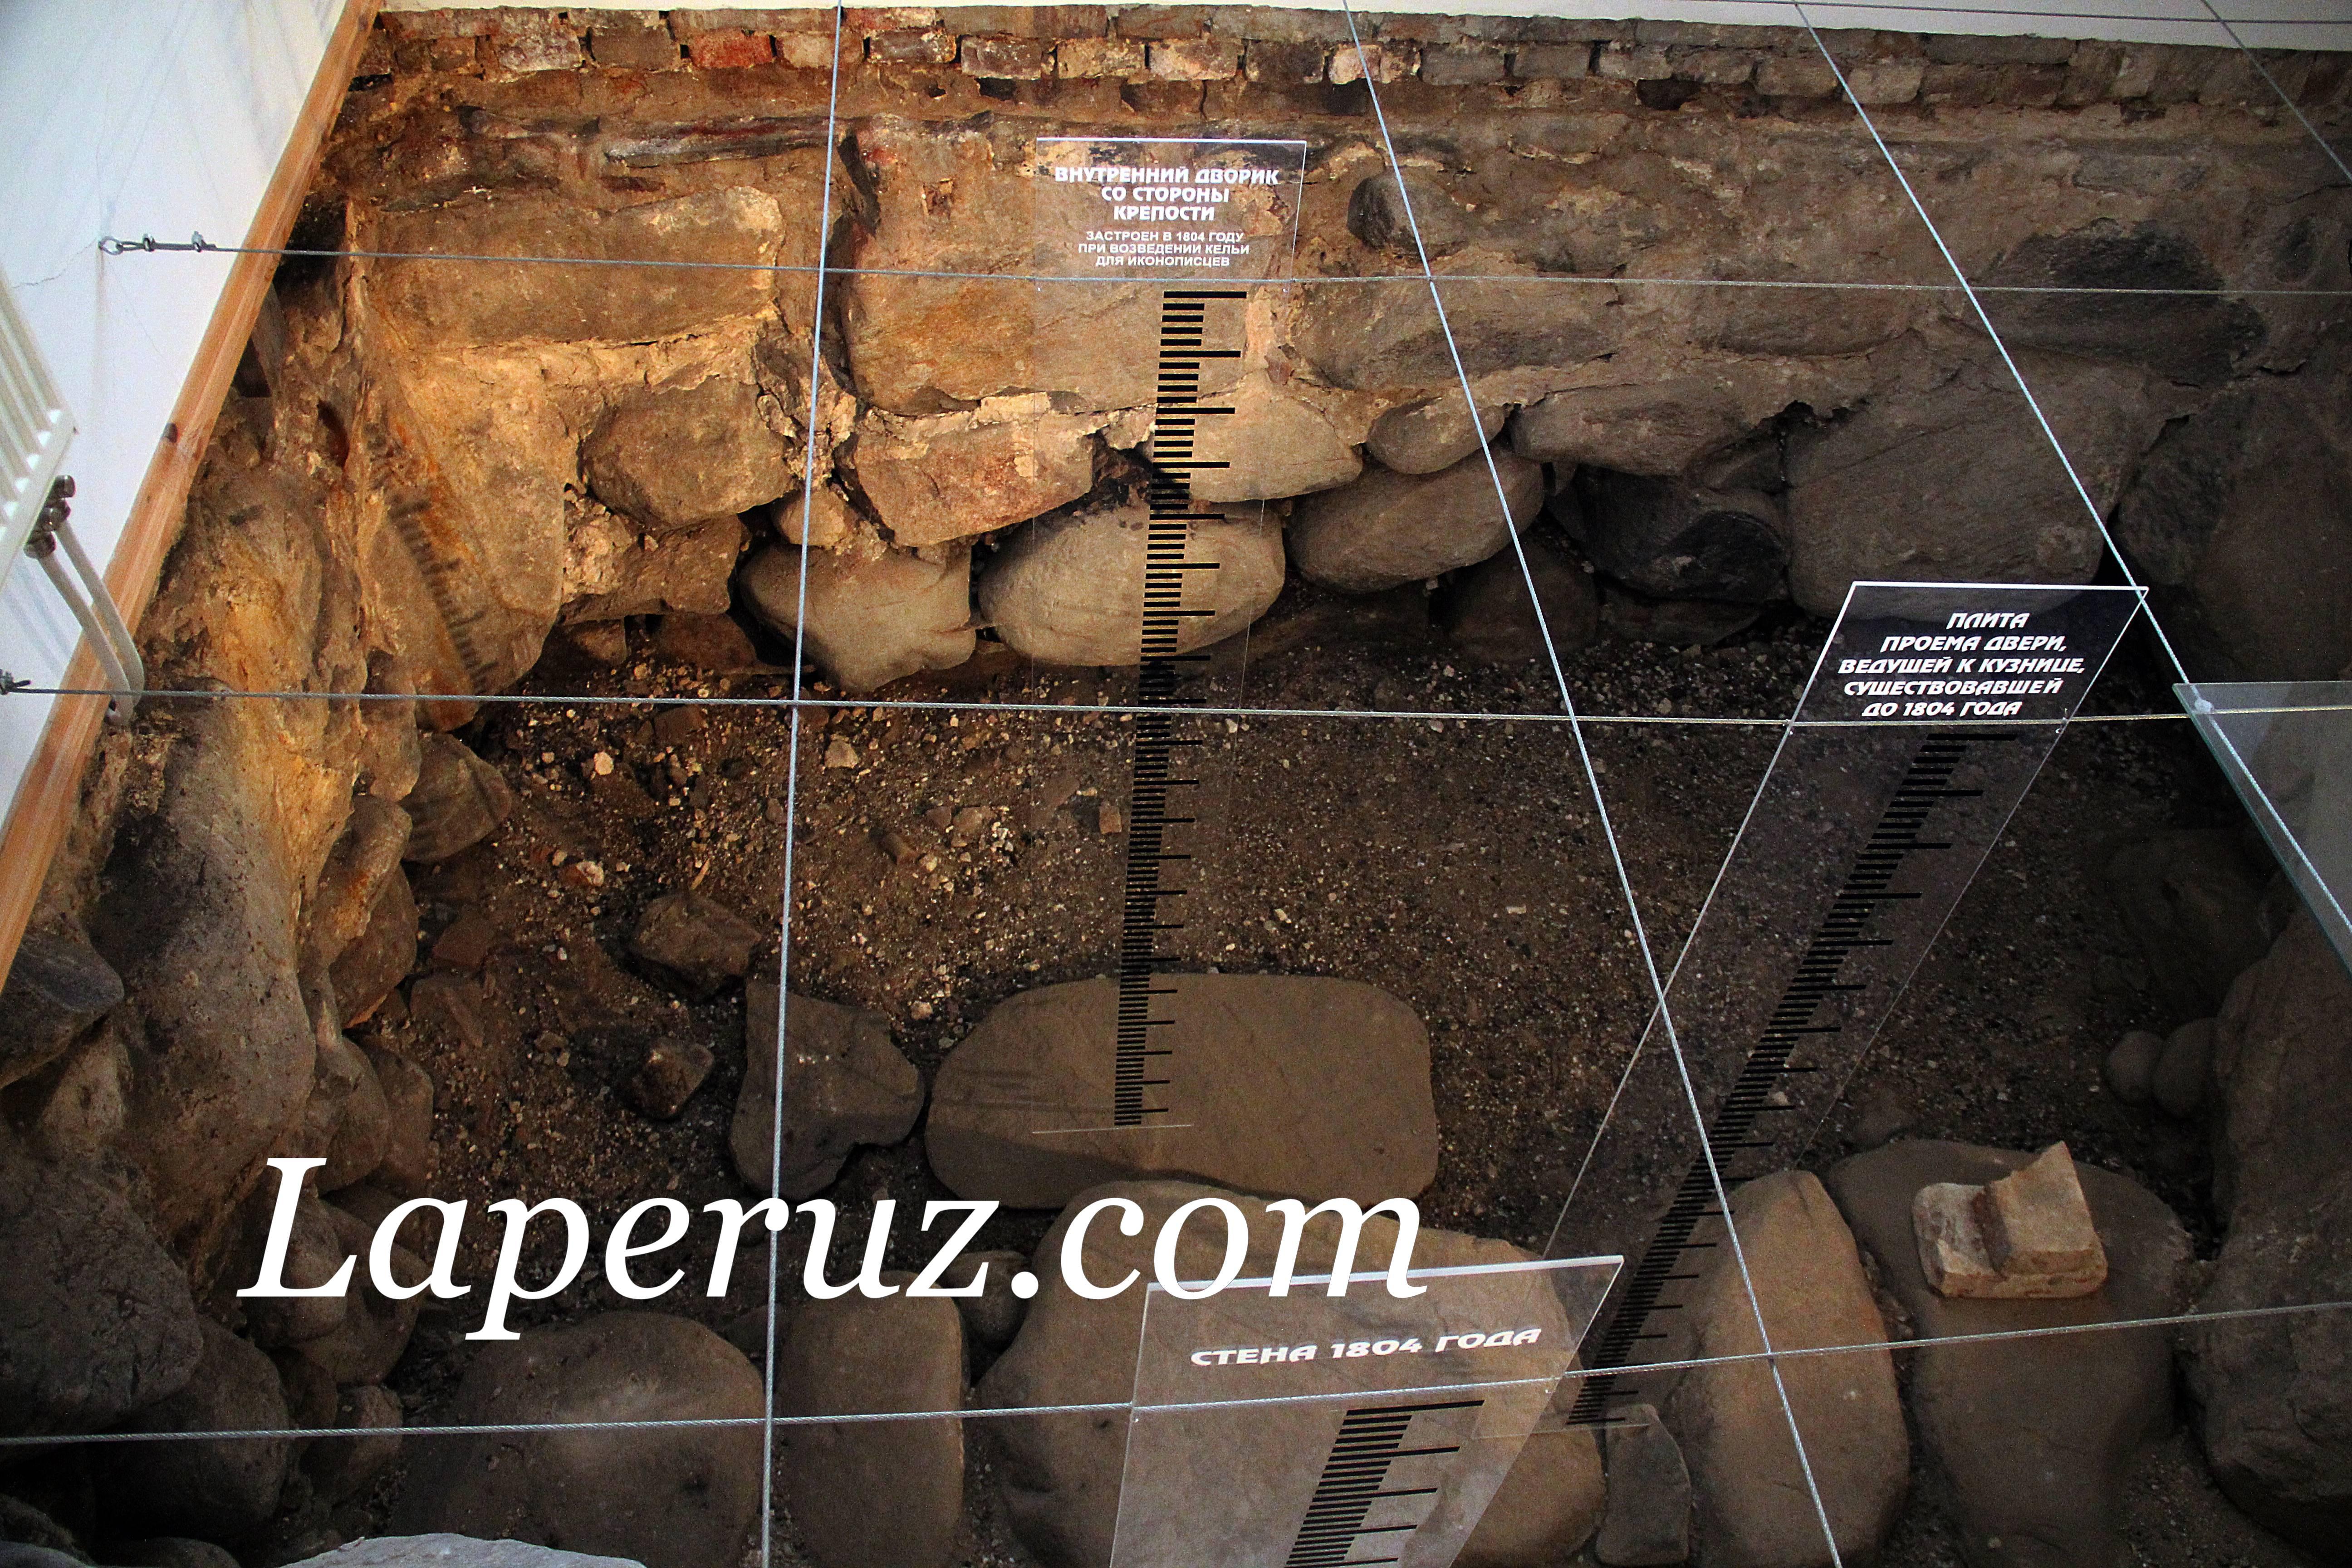 arheologicheskii_muzei_solovki_fundament_6